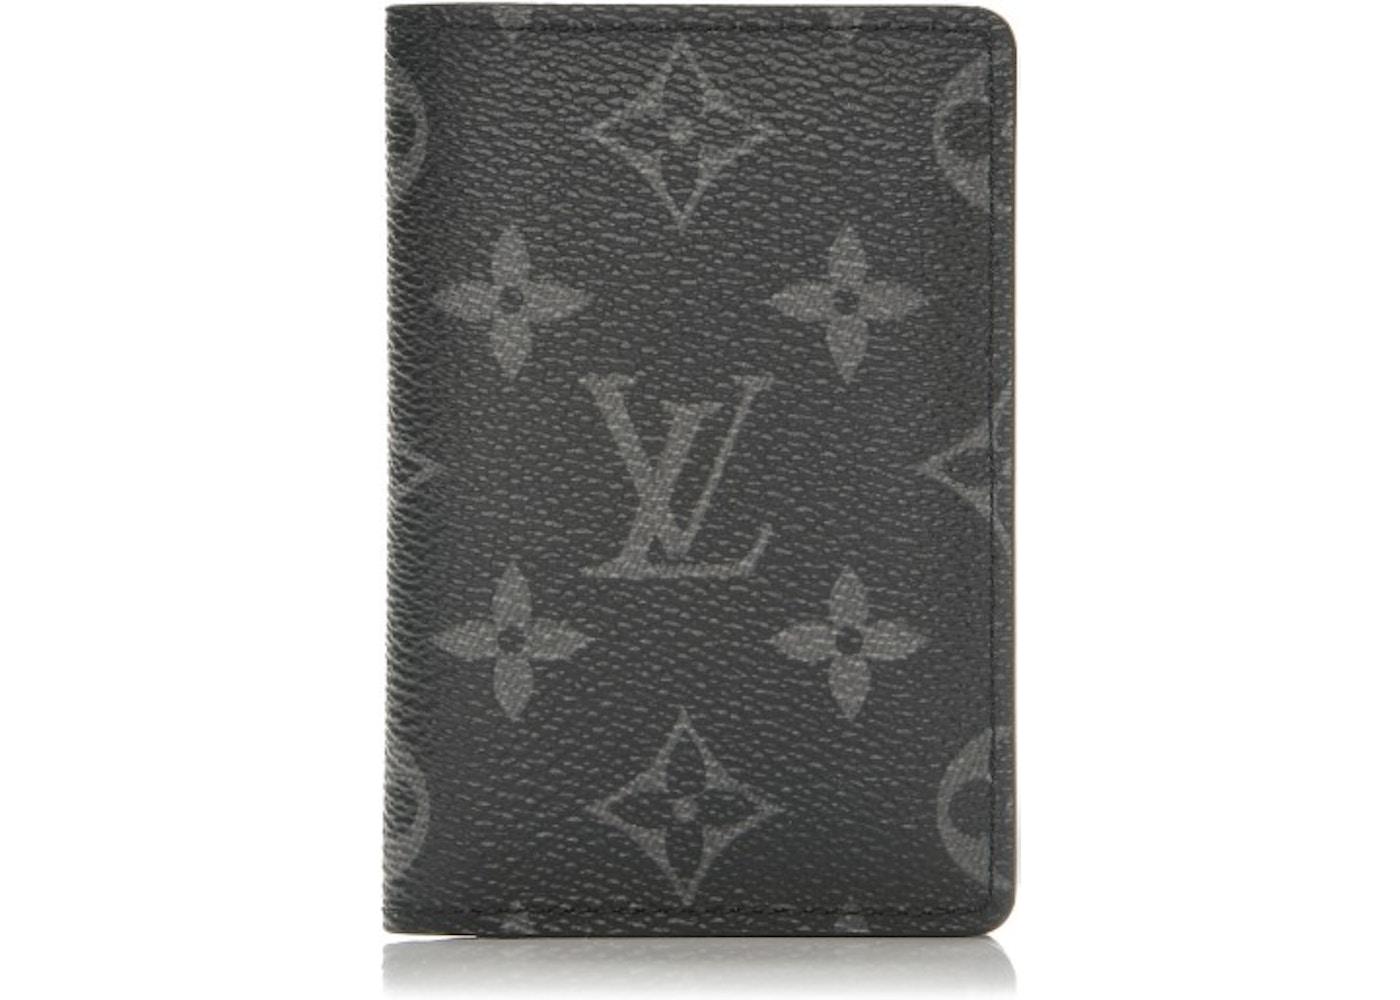 137c2b47755c Louis Vuitton Card Holder Eclipse Monogram Gray. Monogram Gray